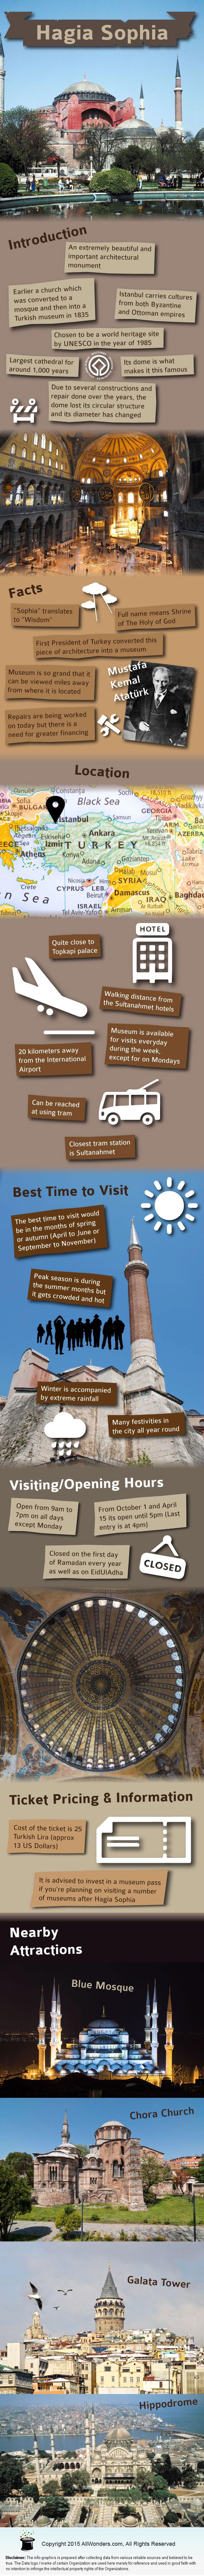 Hagia Sophia Infographic